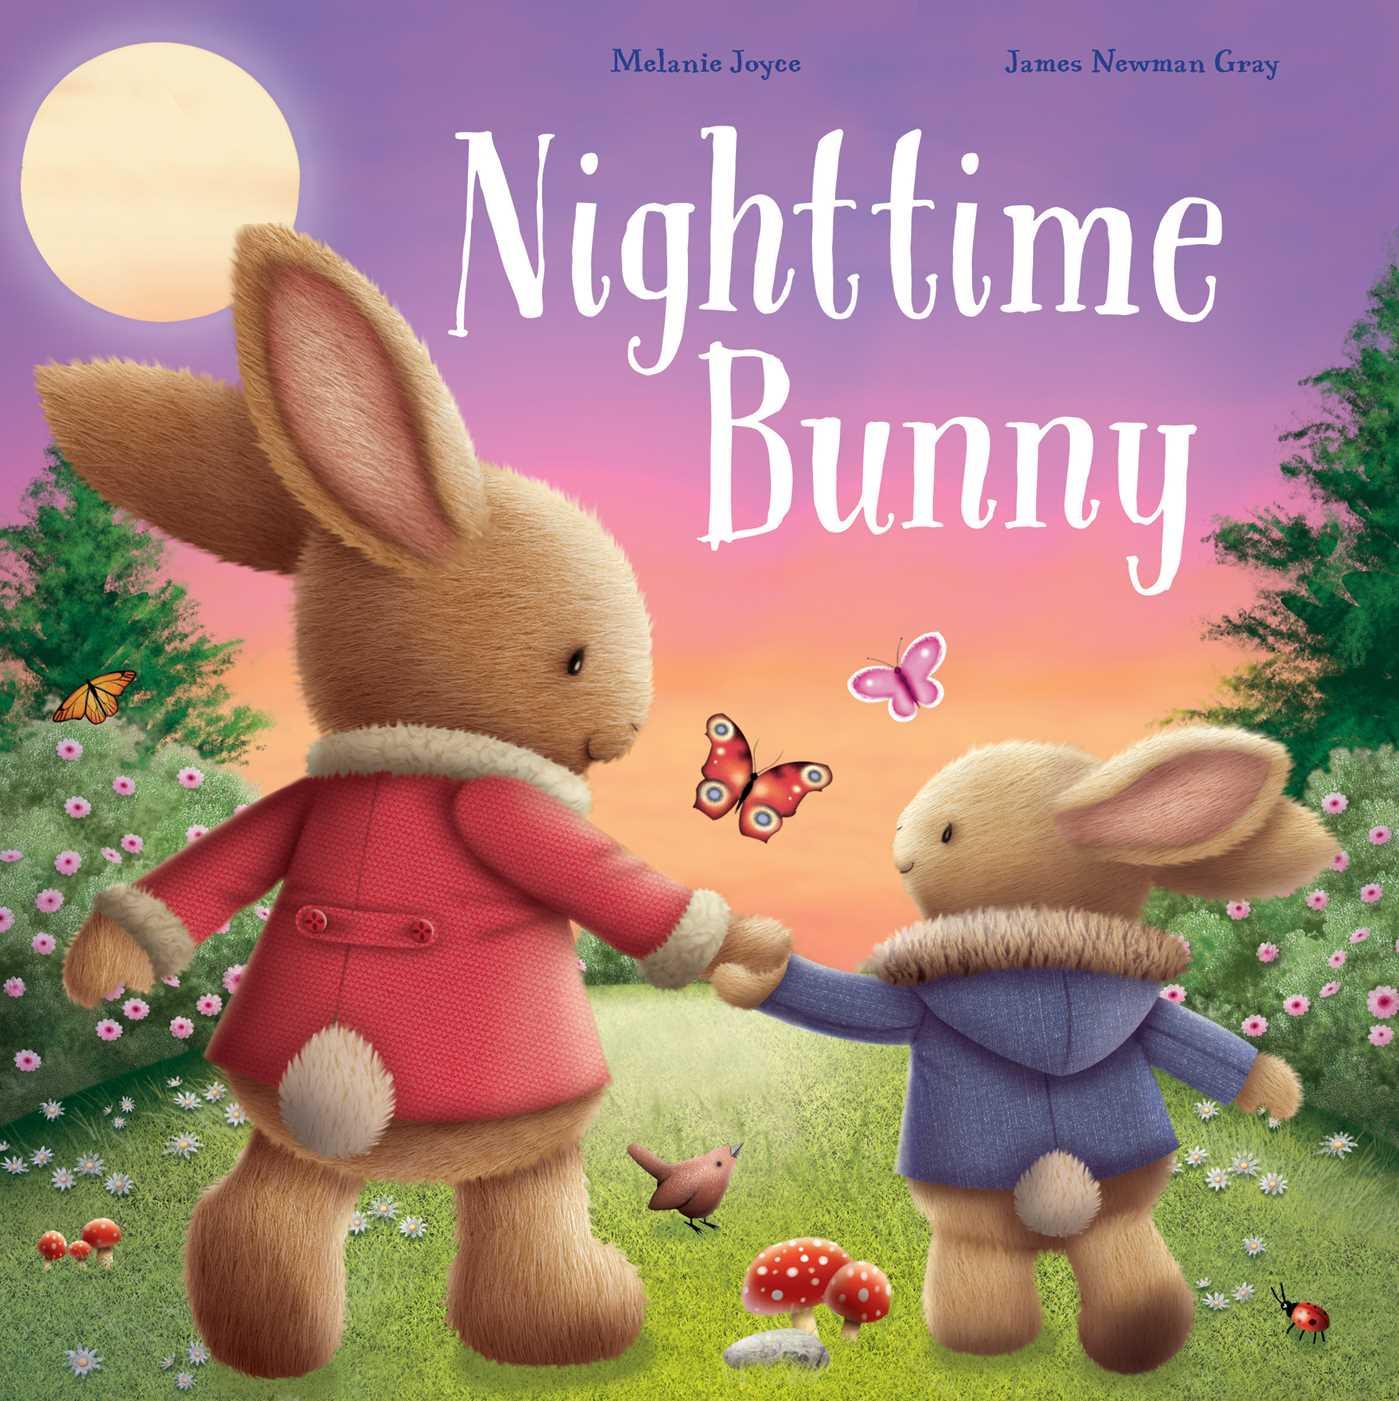 Nighttime bunny 9781499880816 hr